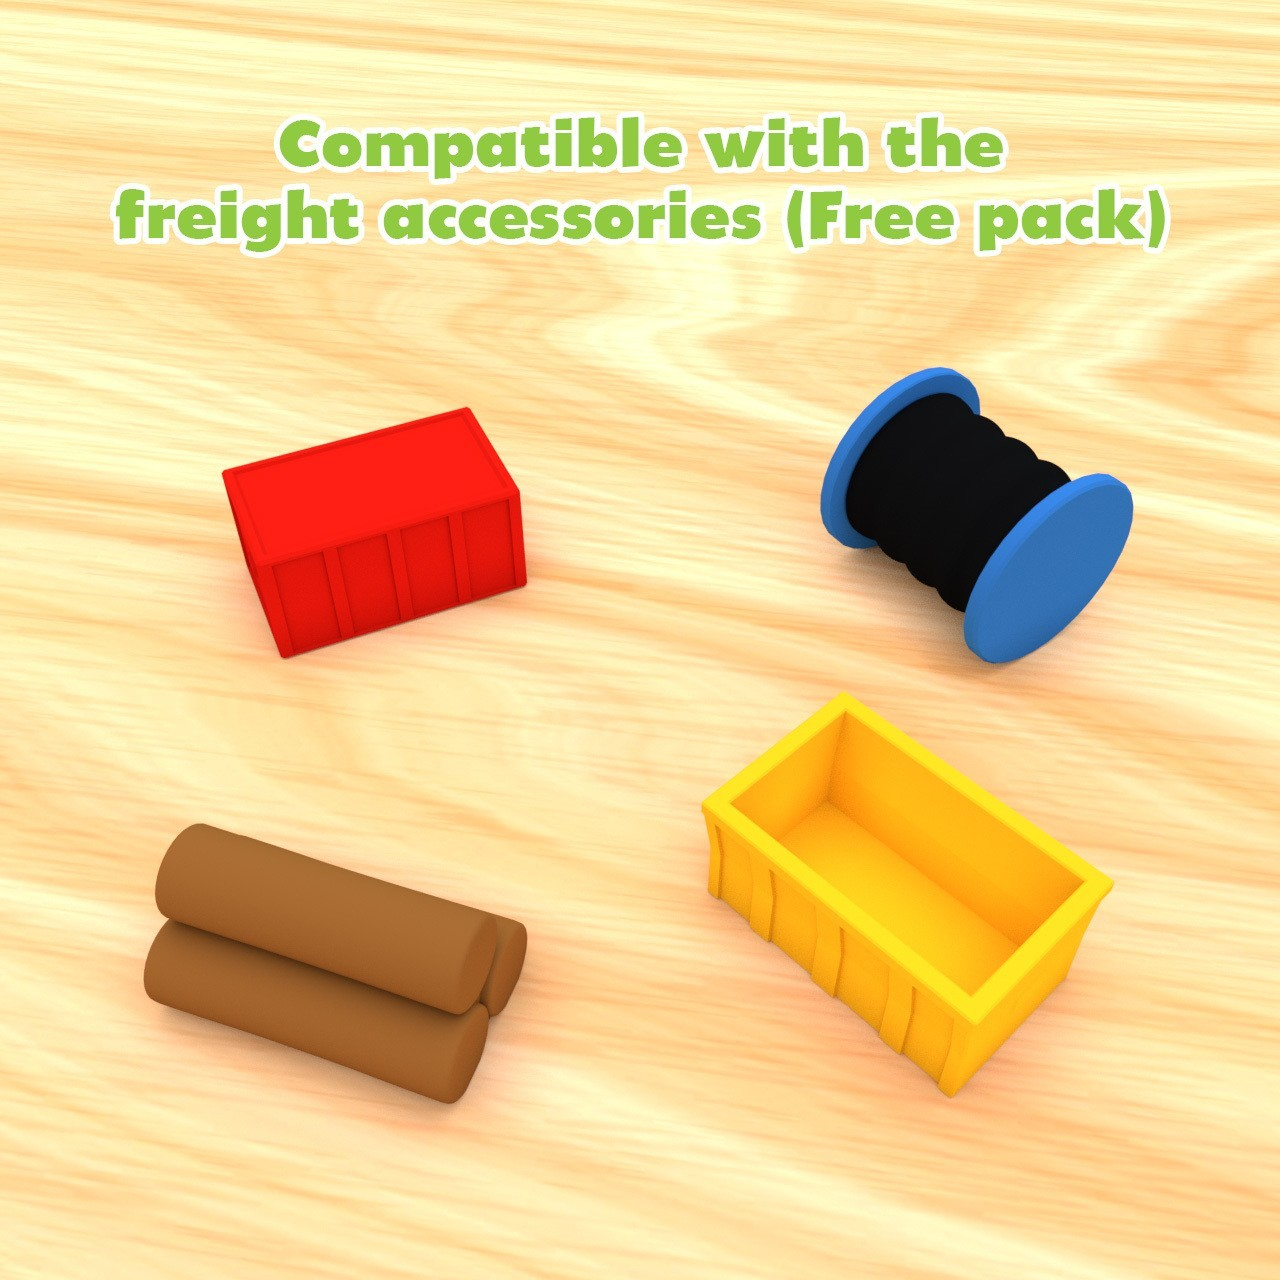 SmallToys-FreightAccessoriesCompatible.jpg Download STL file SmallToys - Starter Pack • 3D printer model, Wabby